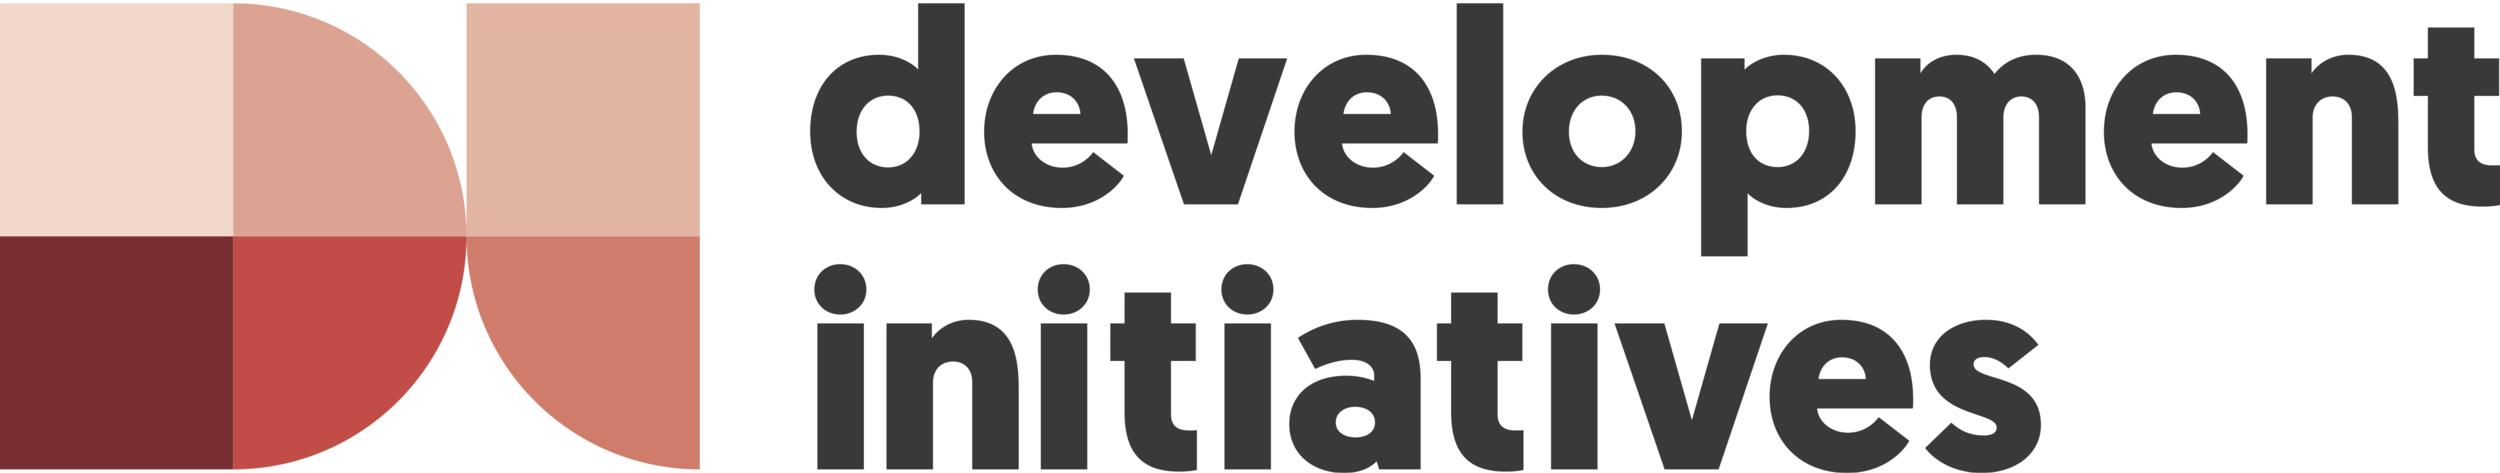 Development_Initiatives_Primary Logo_CMYK(1).png